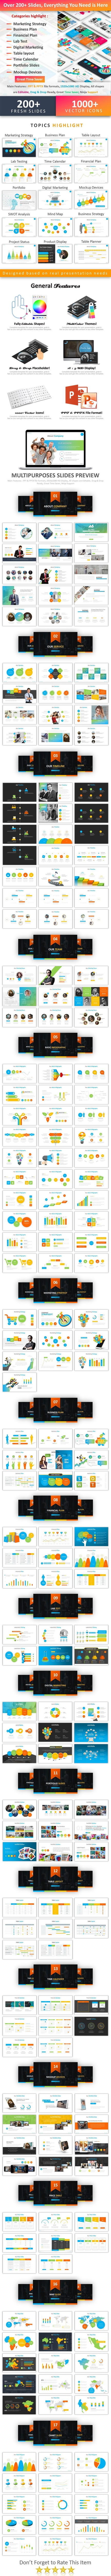 GraphicRiver Biz Pro Powerpoint 21117459